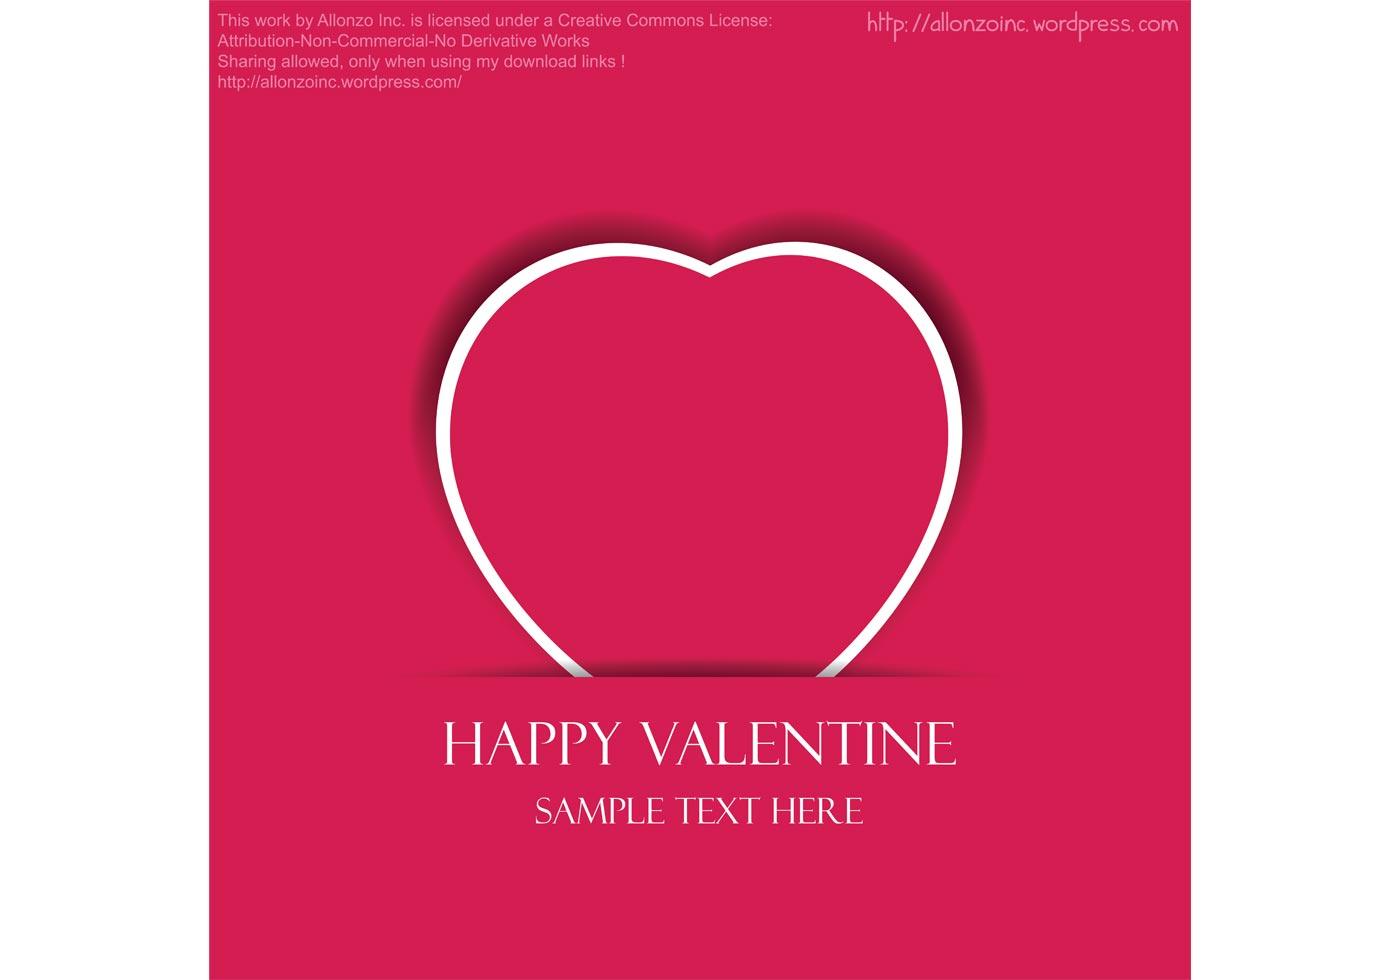 Valentine Heart Vector Card | Free Vector Art at Vecteezy!